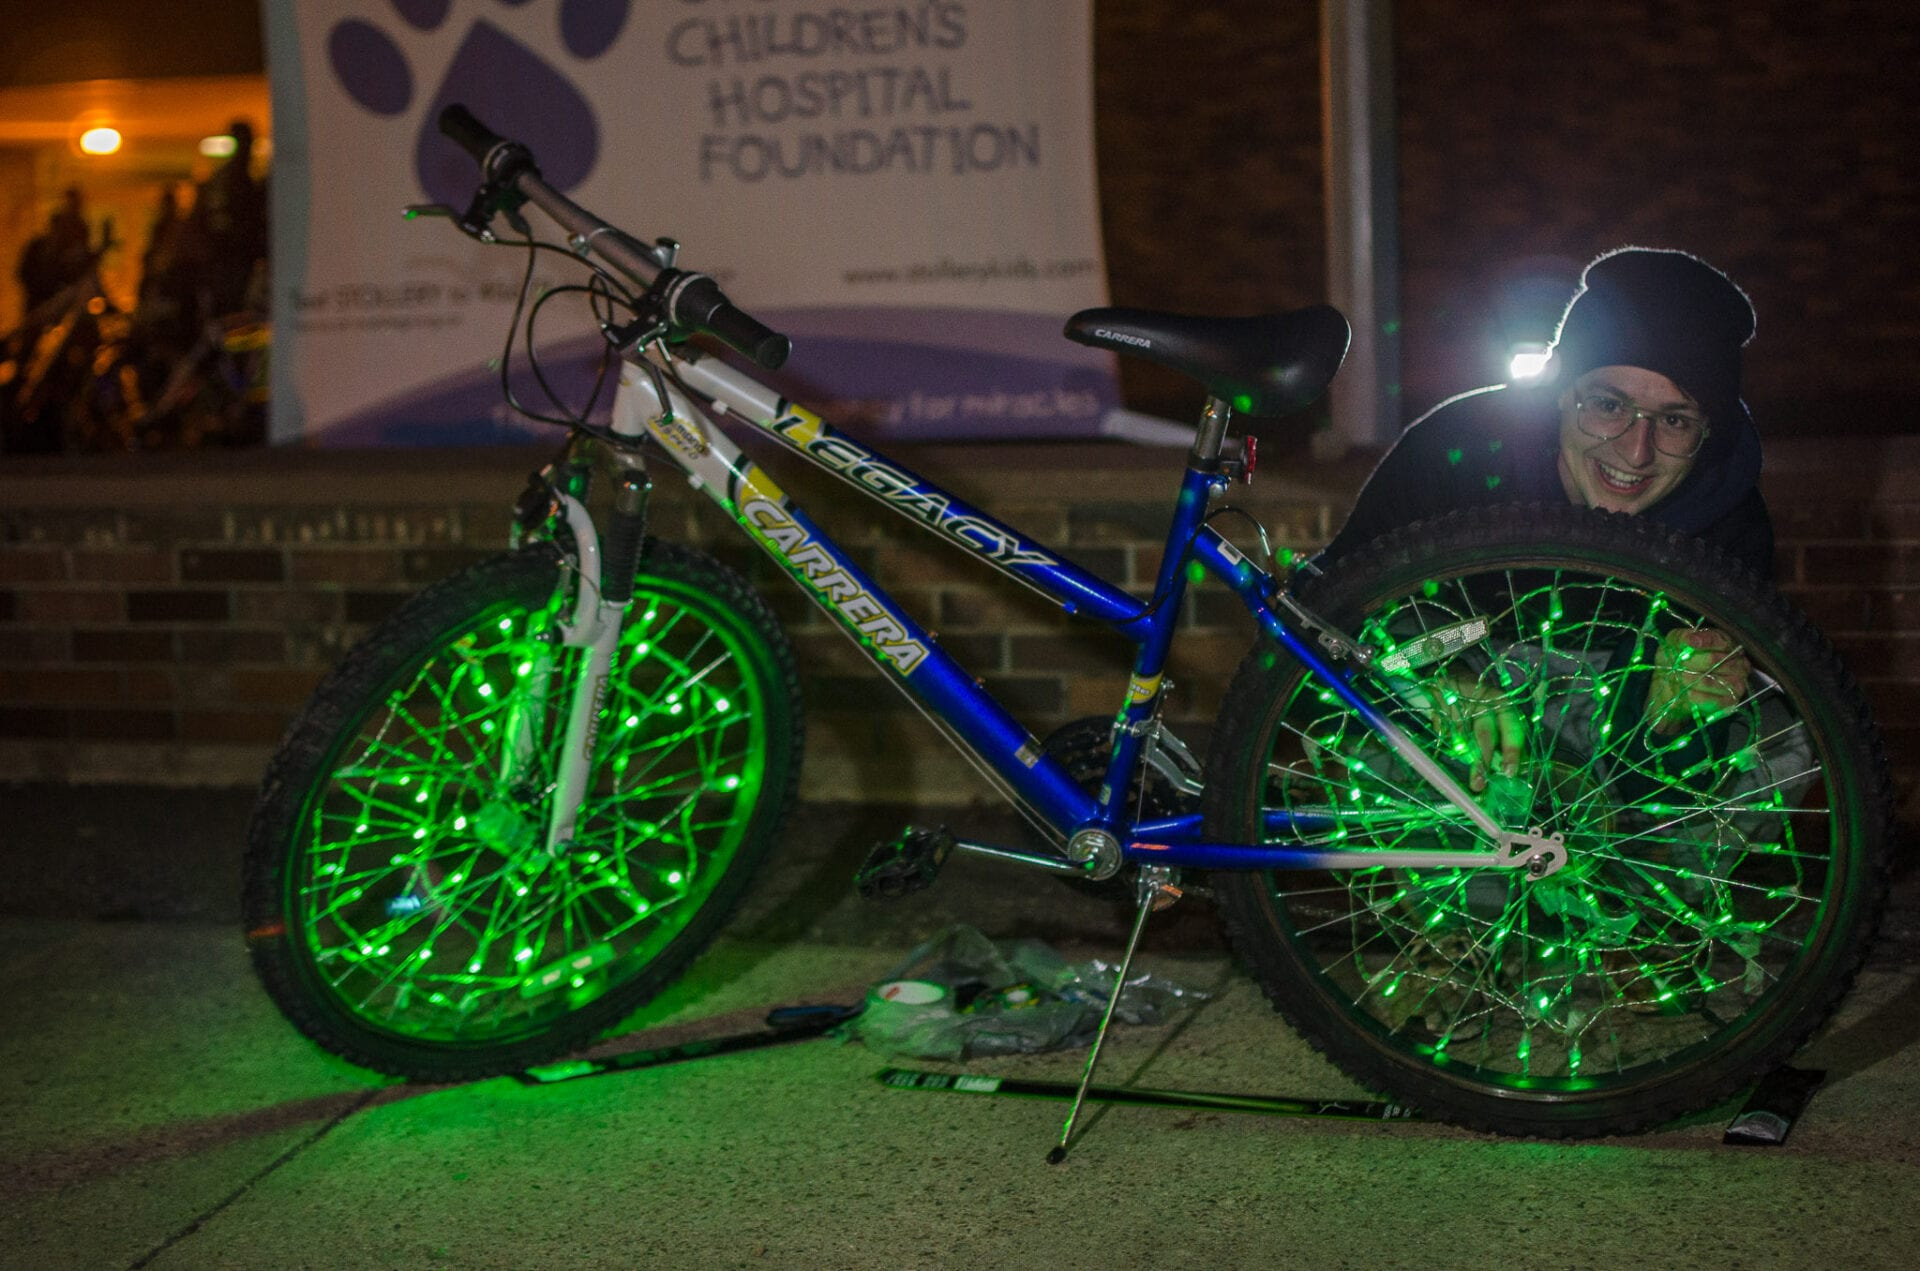 Children Stollery Hospital BikethruTheNight Fundraiser